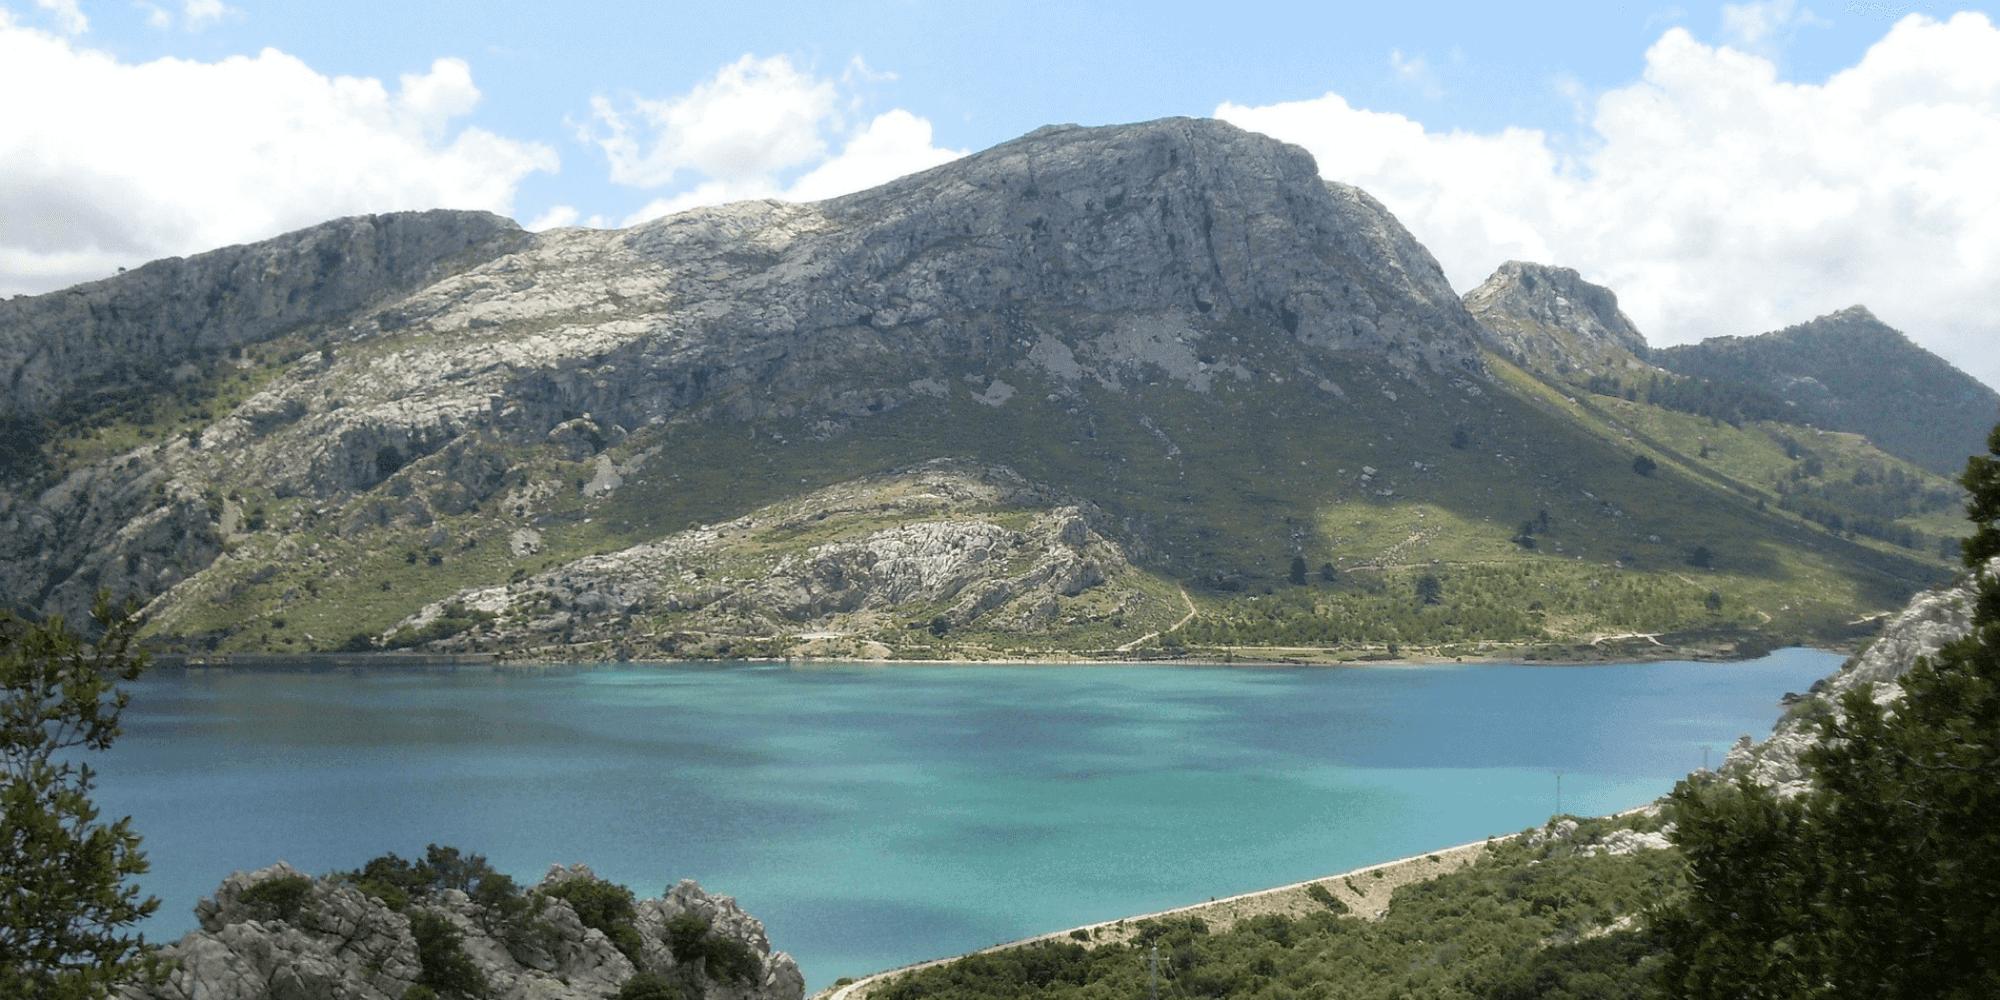 Gorg Blau in Mallorca